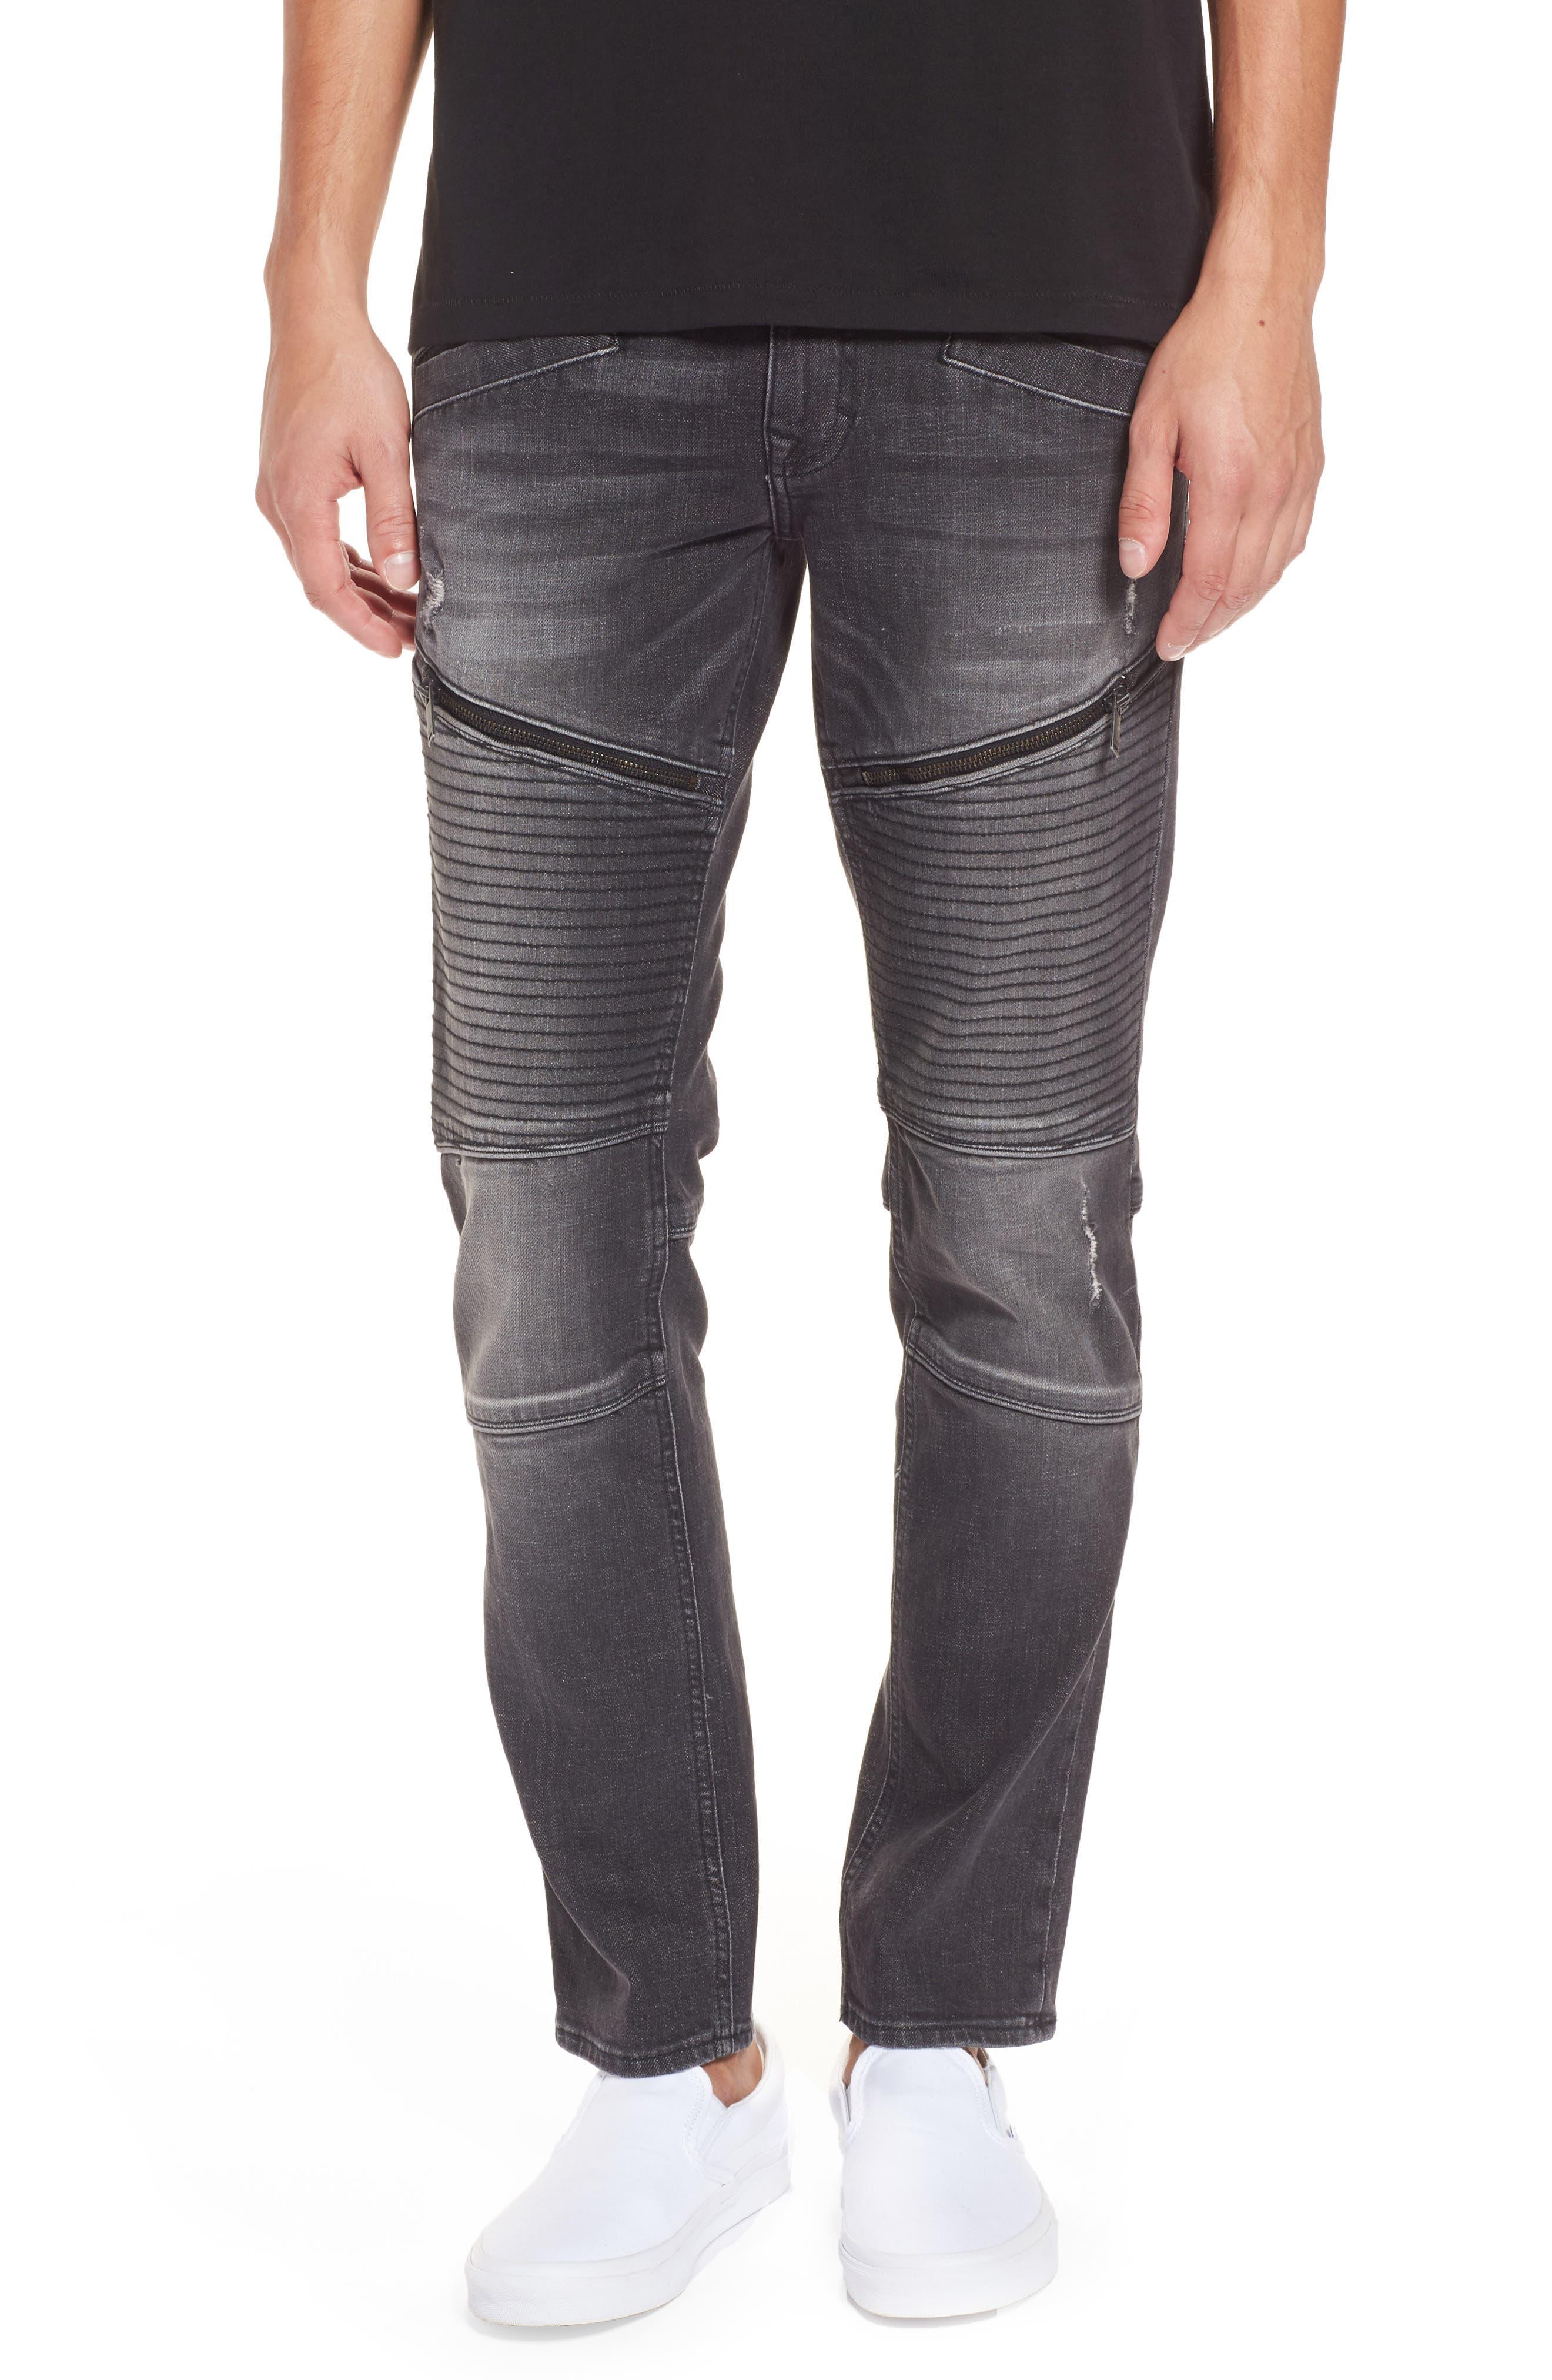 Biker Denim Jeans,                         Main,                         color, Black